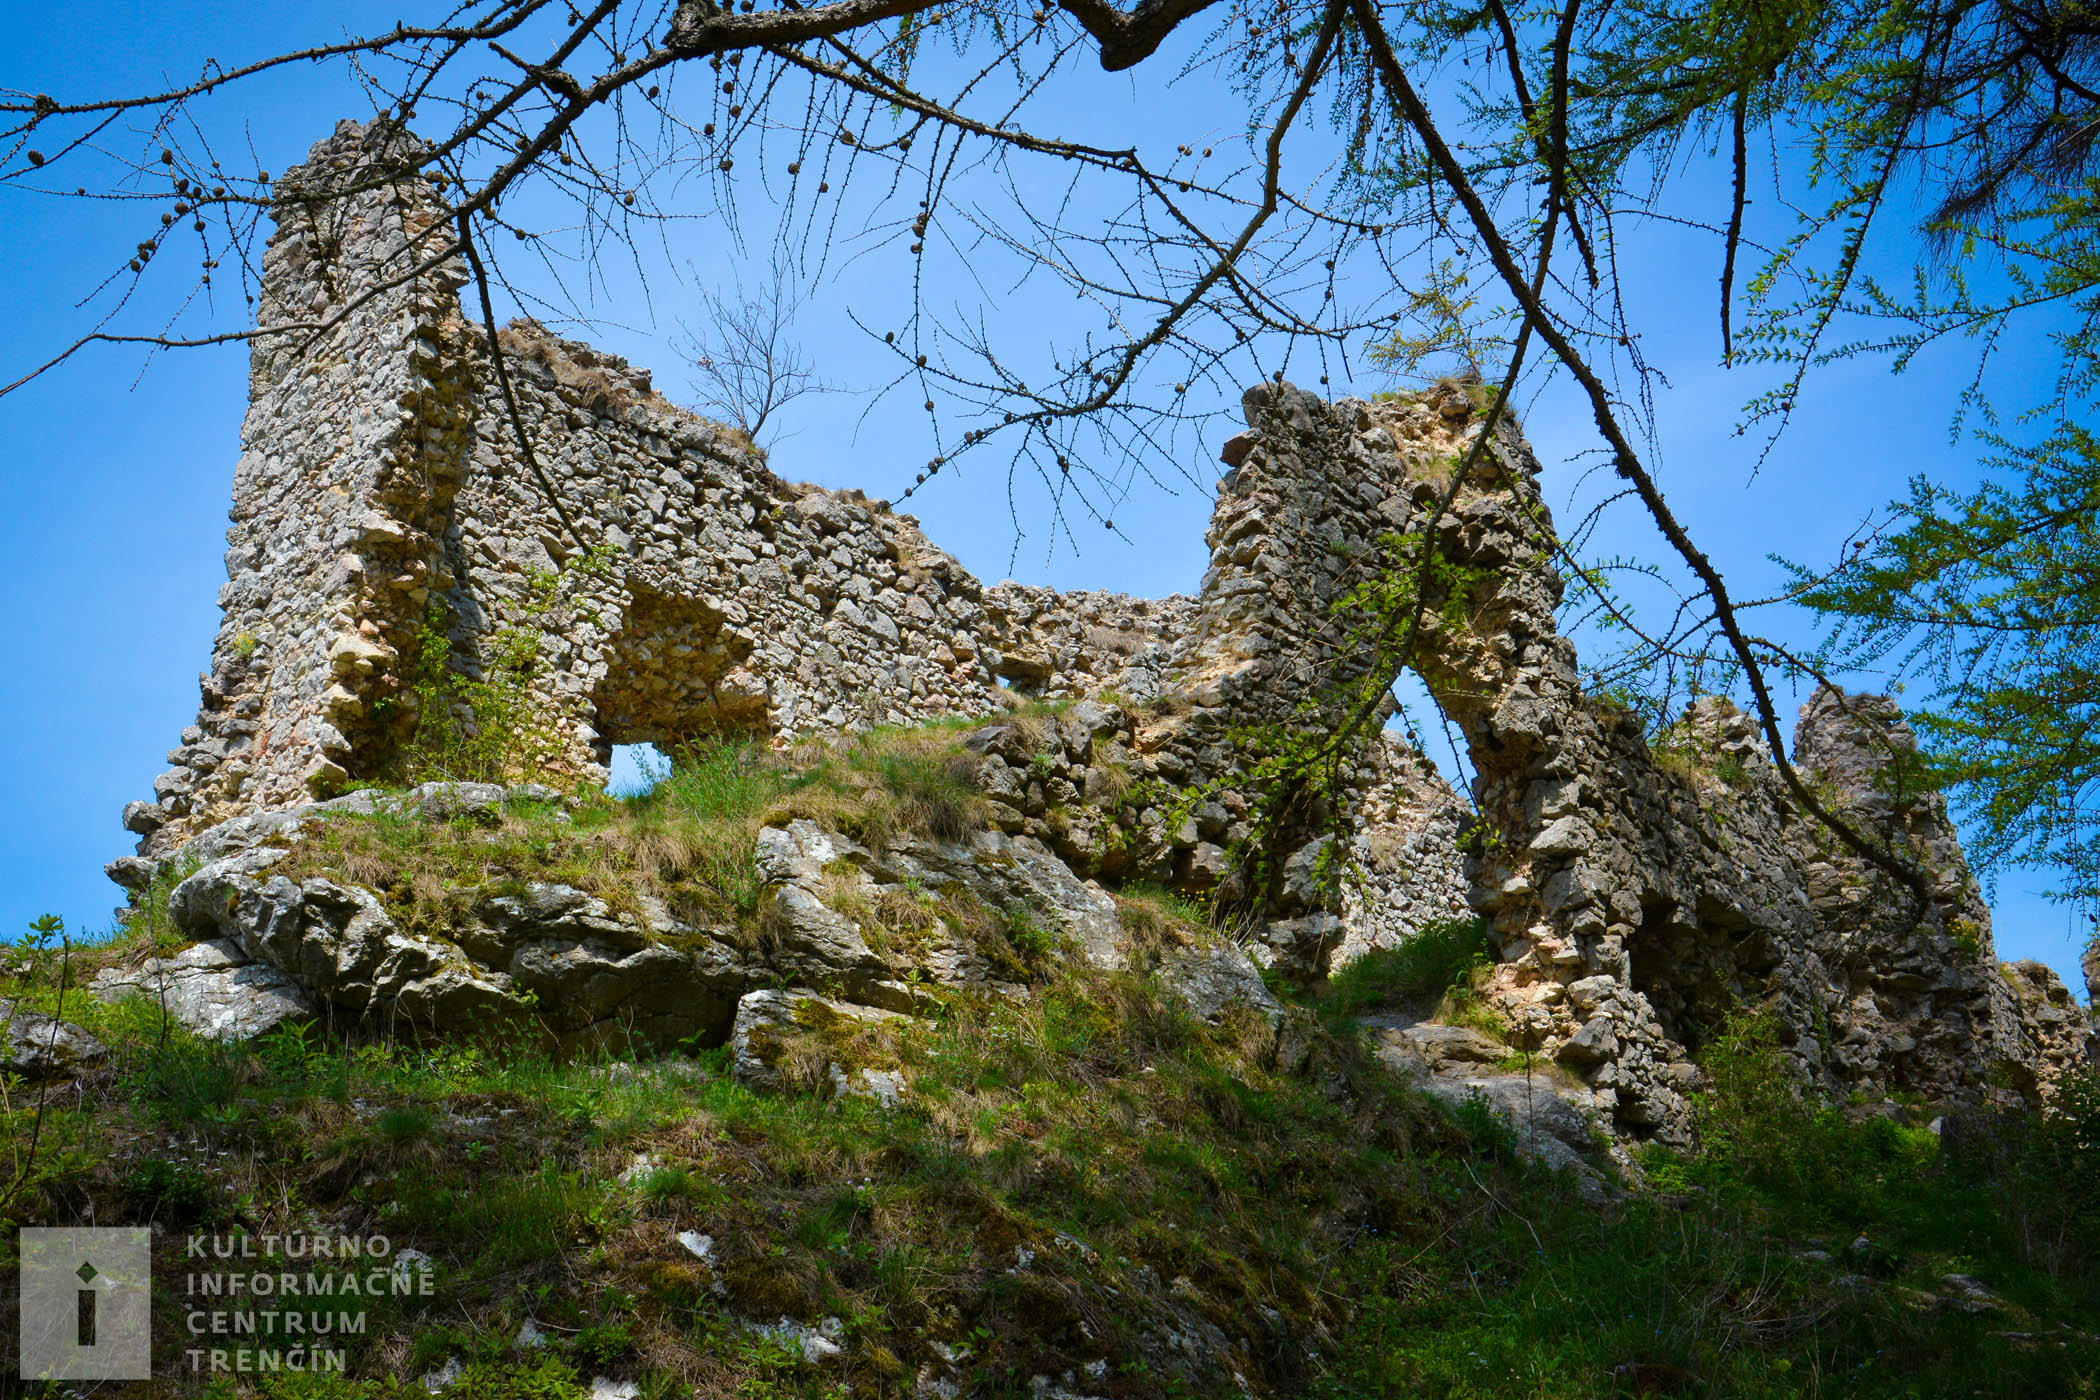 Ruiny hradu Vršatec/Vršatec Castle ruins